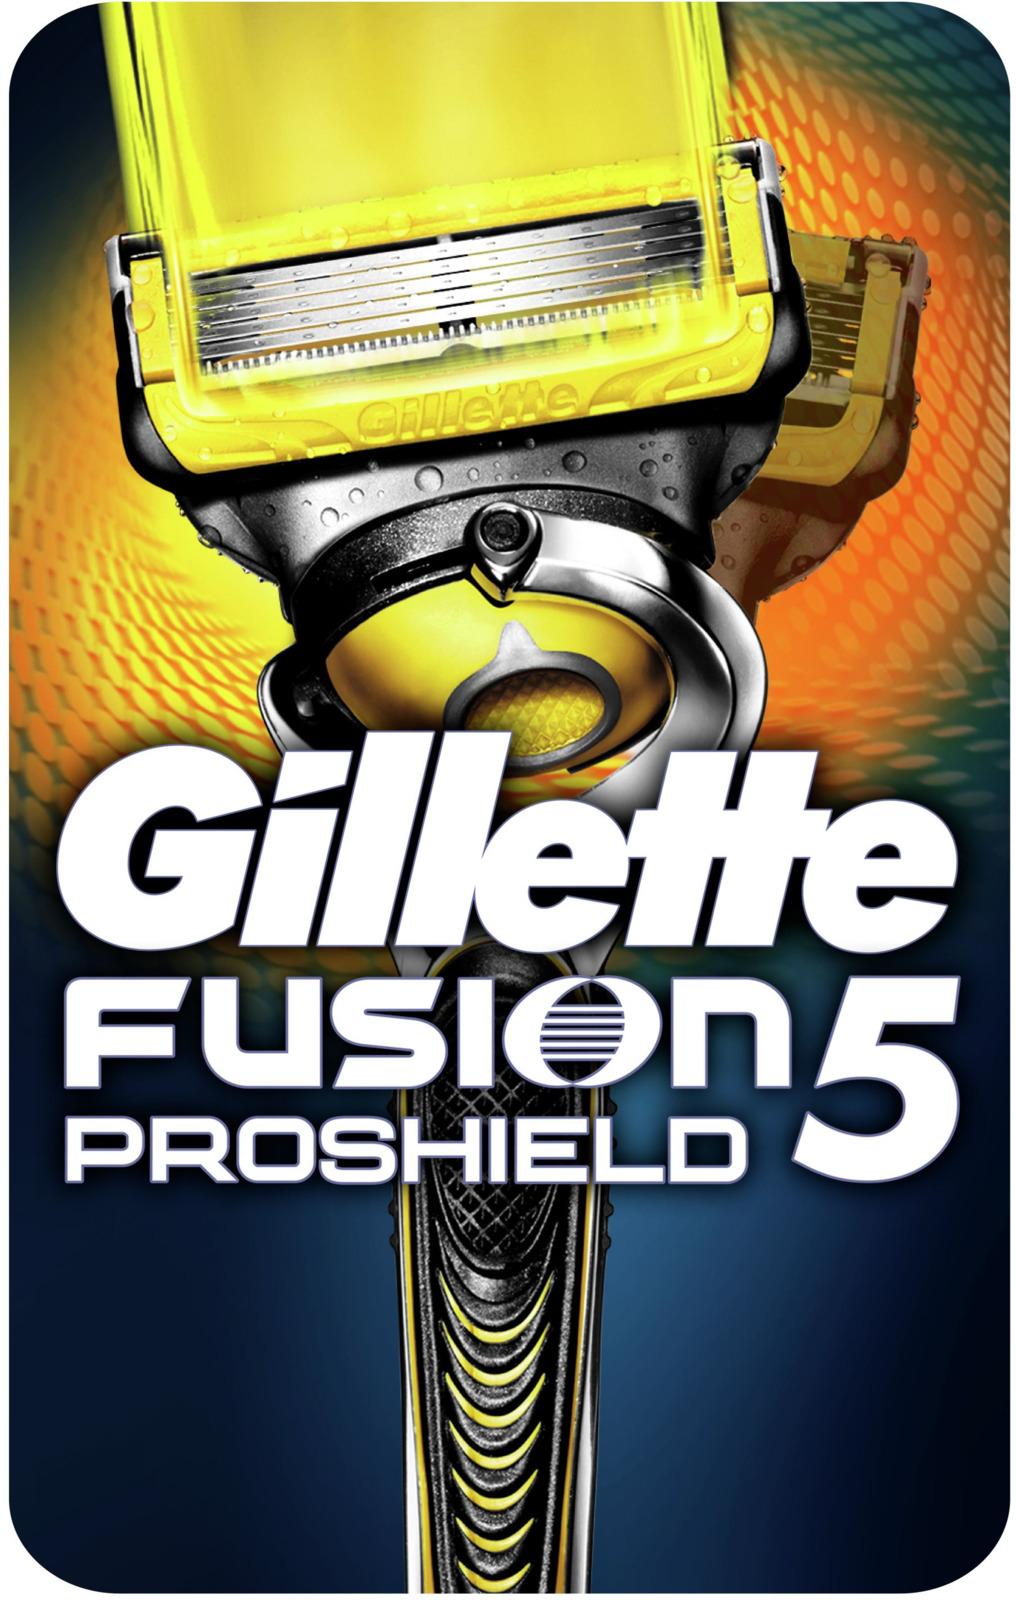 Мужская Бритва Gillette Fusion5 ProShield с 1 кассетой